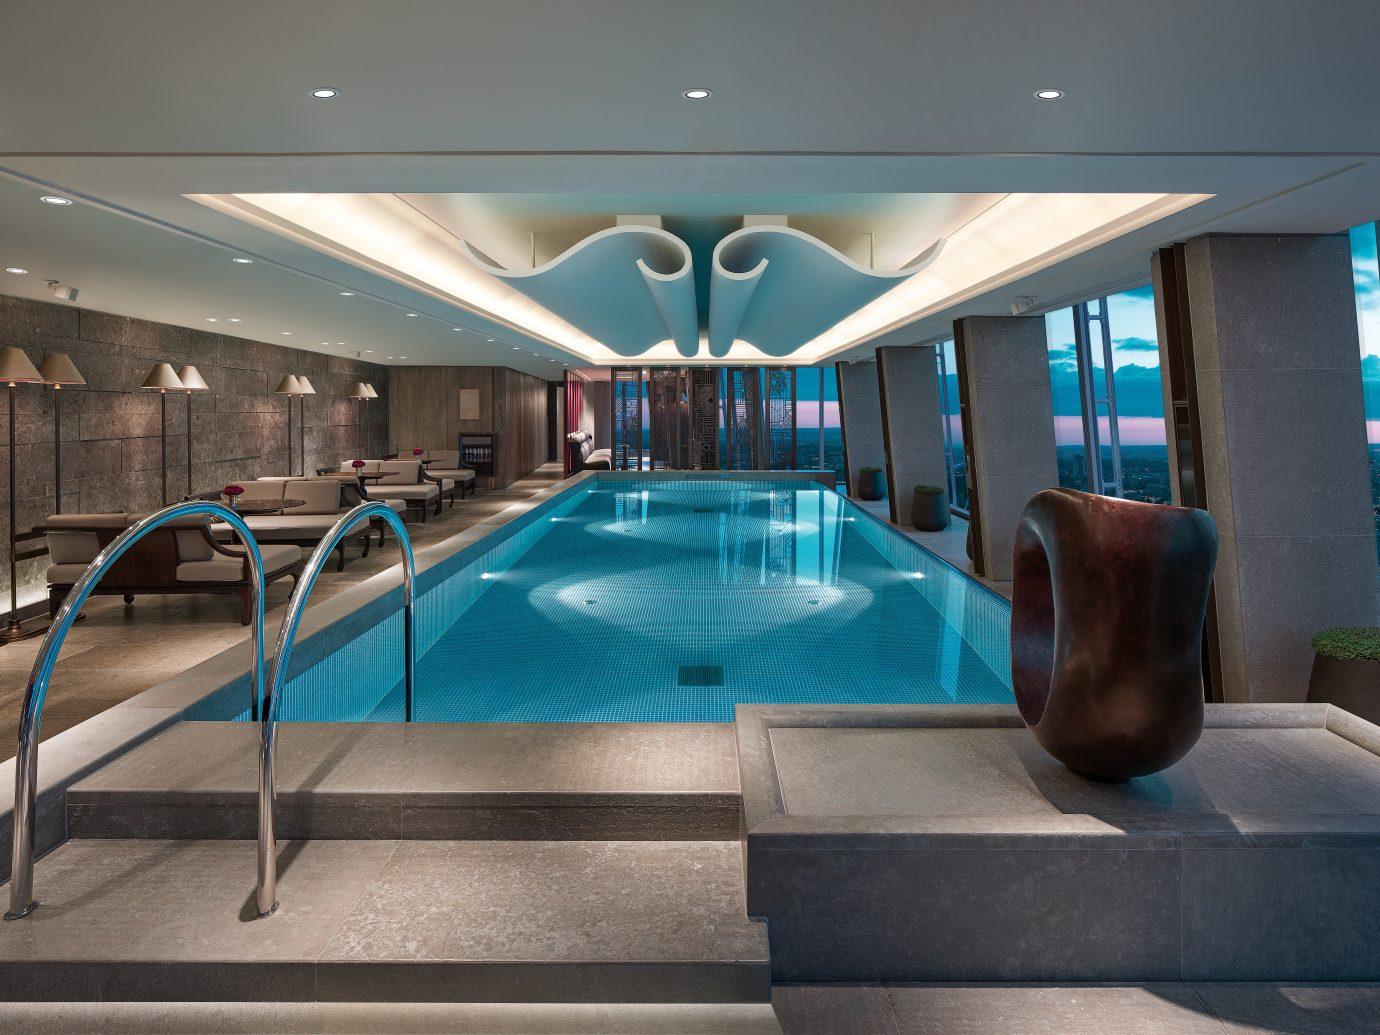 Boutique Hotels Hotels Living London Lounge Modern Pool Romantic Hotels floor indoor swimming pool room ceiling Lobby estate interior design blue Resort